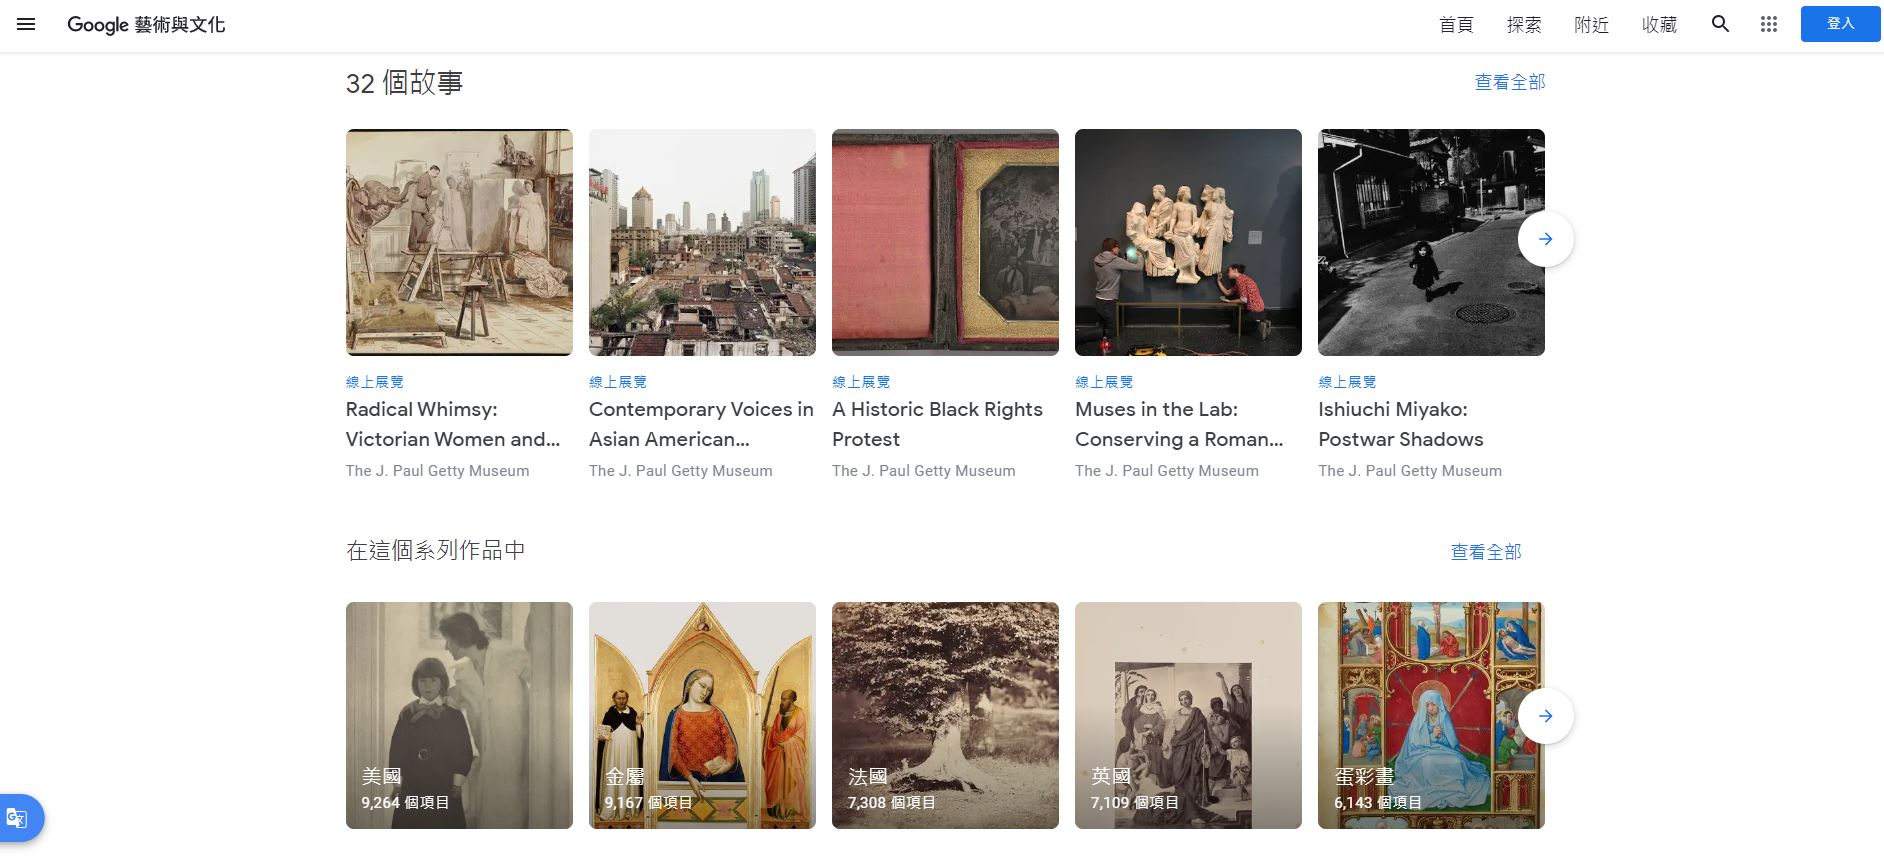 J·保羅·蓋蒂博物館,蓋蒂中心,讓・保羅・蓋蒂,蓋蒂別墅,堅.保羅·蓋蒂博物館,Google Arts & Culture,Google 藝術與文化,虛擬實境美術館,線上博物館,線上展覽,線上美術館